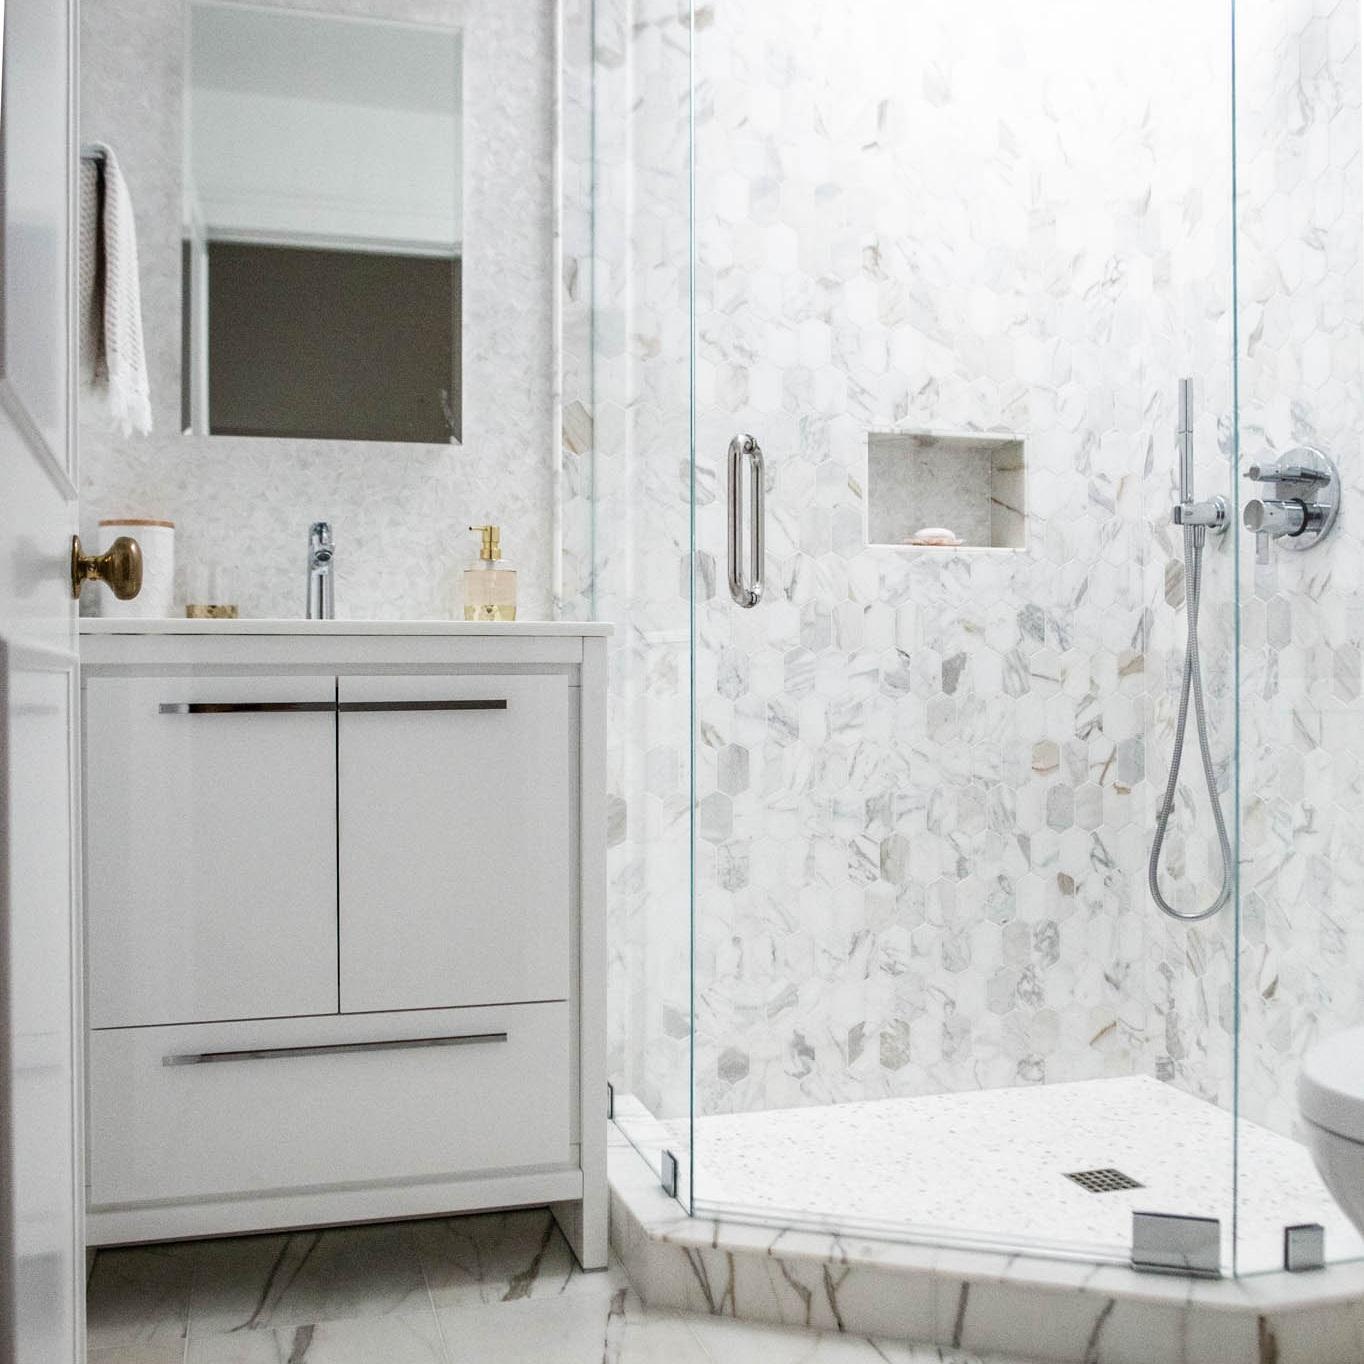 Jodi G Designs Santa Barbra Interior Designer | Spring Interior Design Trends | Large Scale Marble